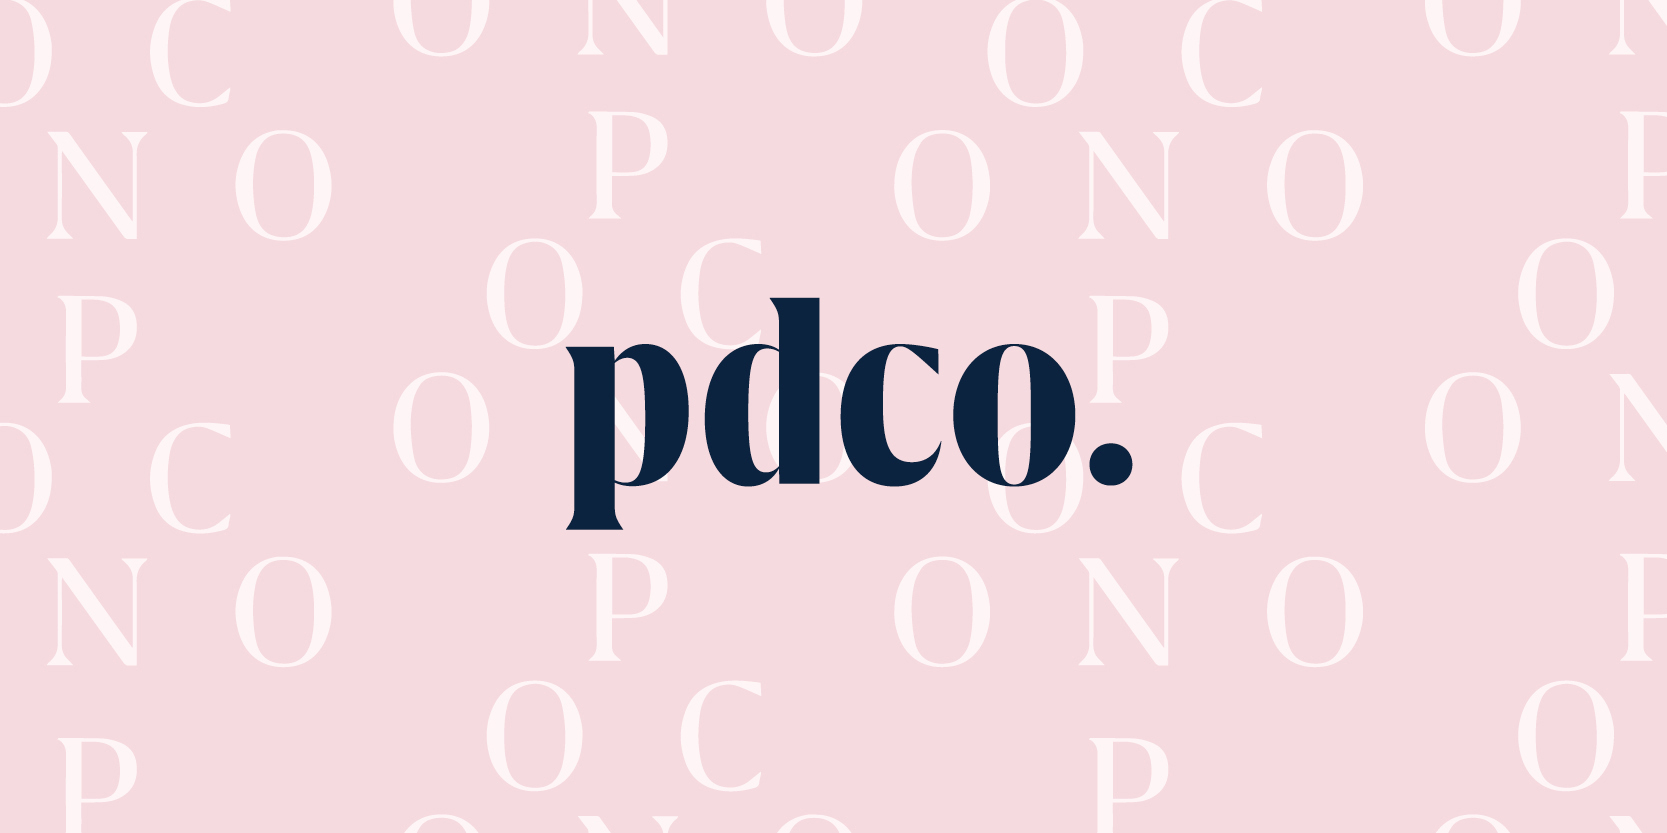 dcwdesign_PDCo9.jpg